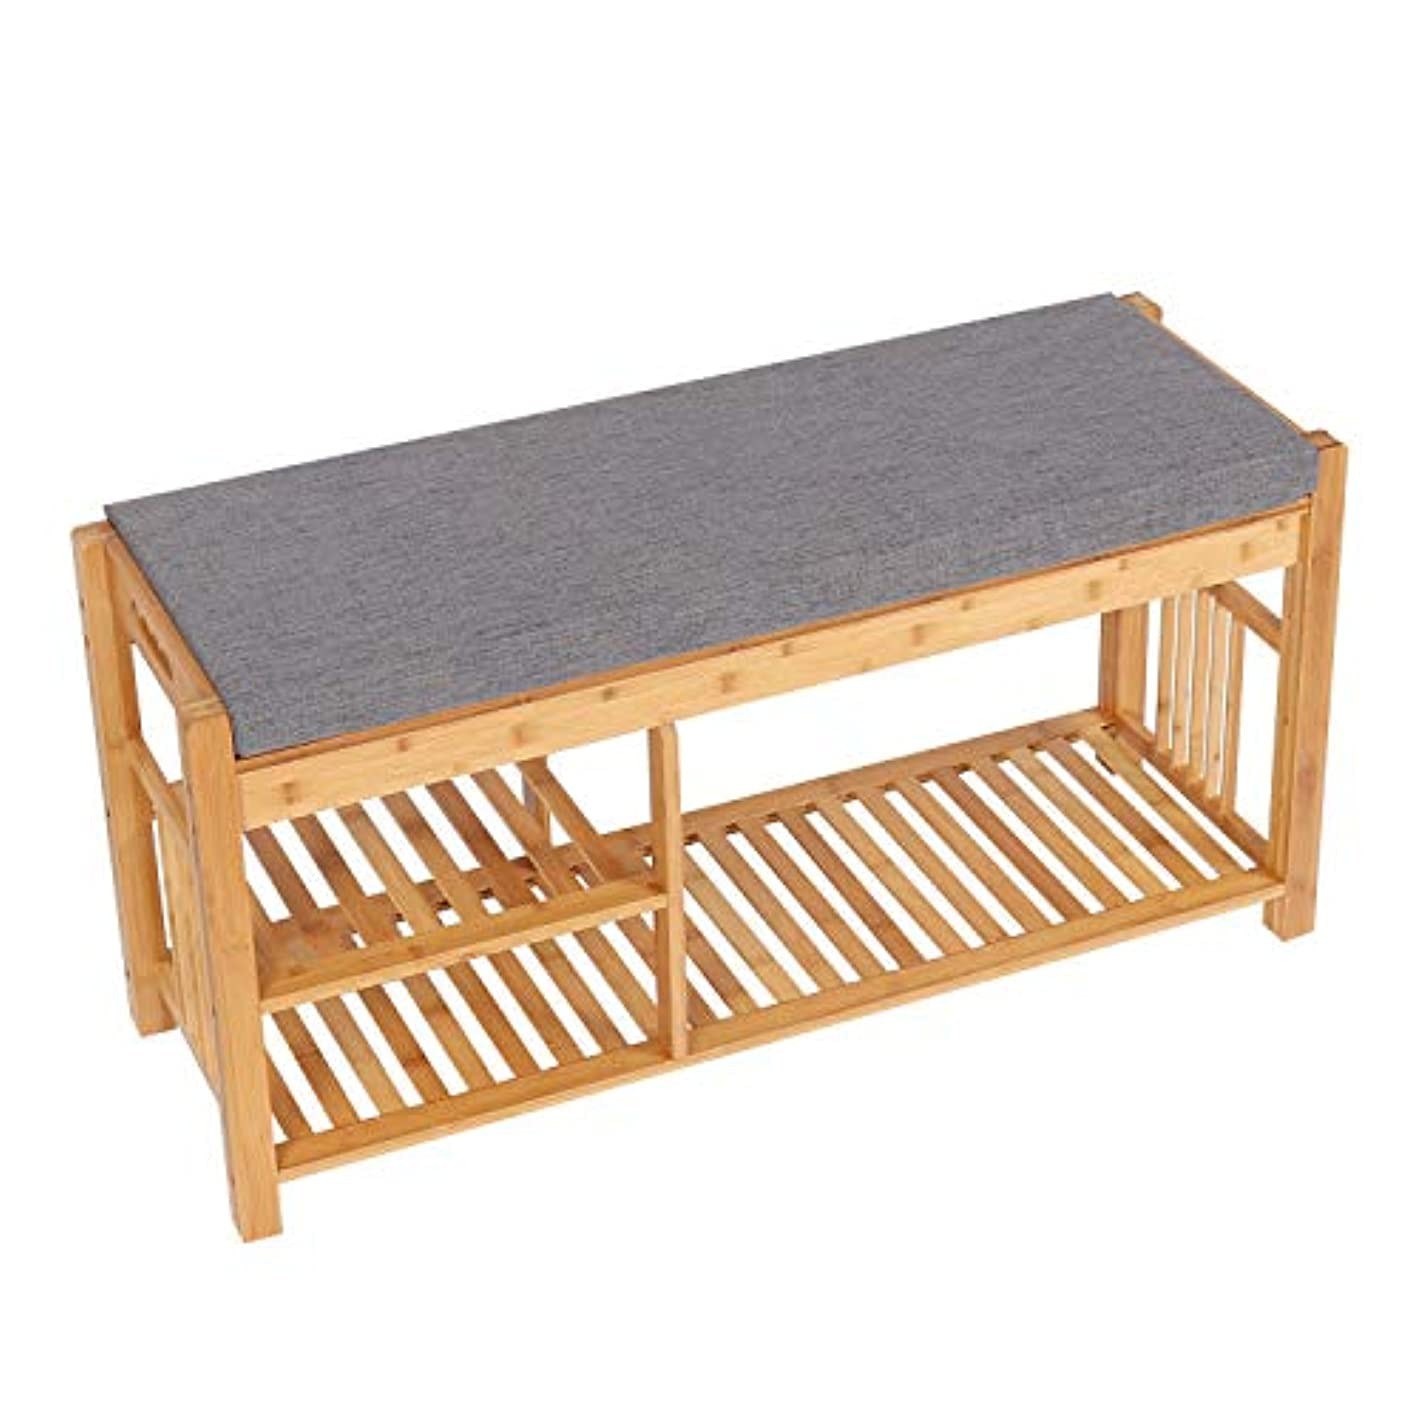 Has_Shop 3 Tier Shoe Boot Rack Storage Shelf Bamboo Bench Tower Organizer w/Padded Seat